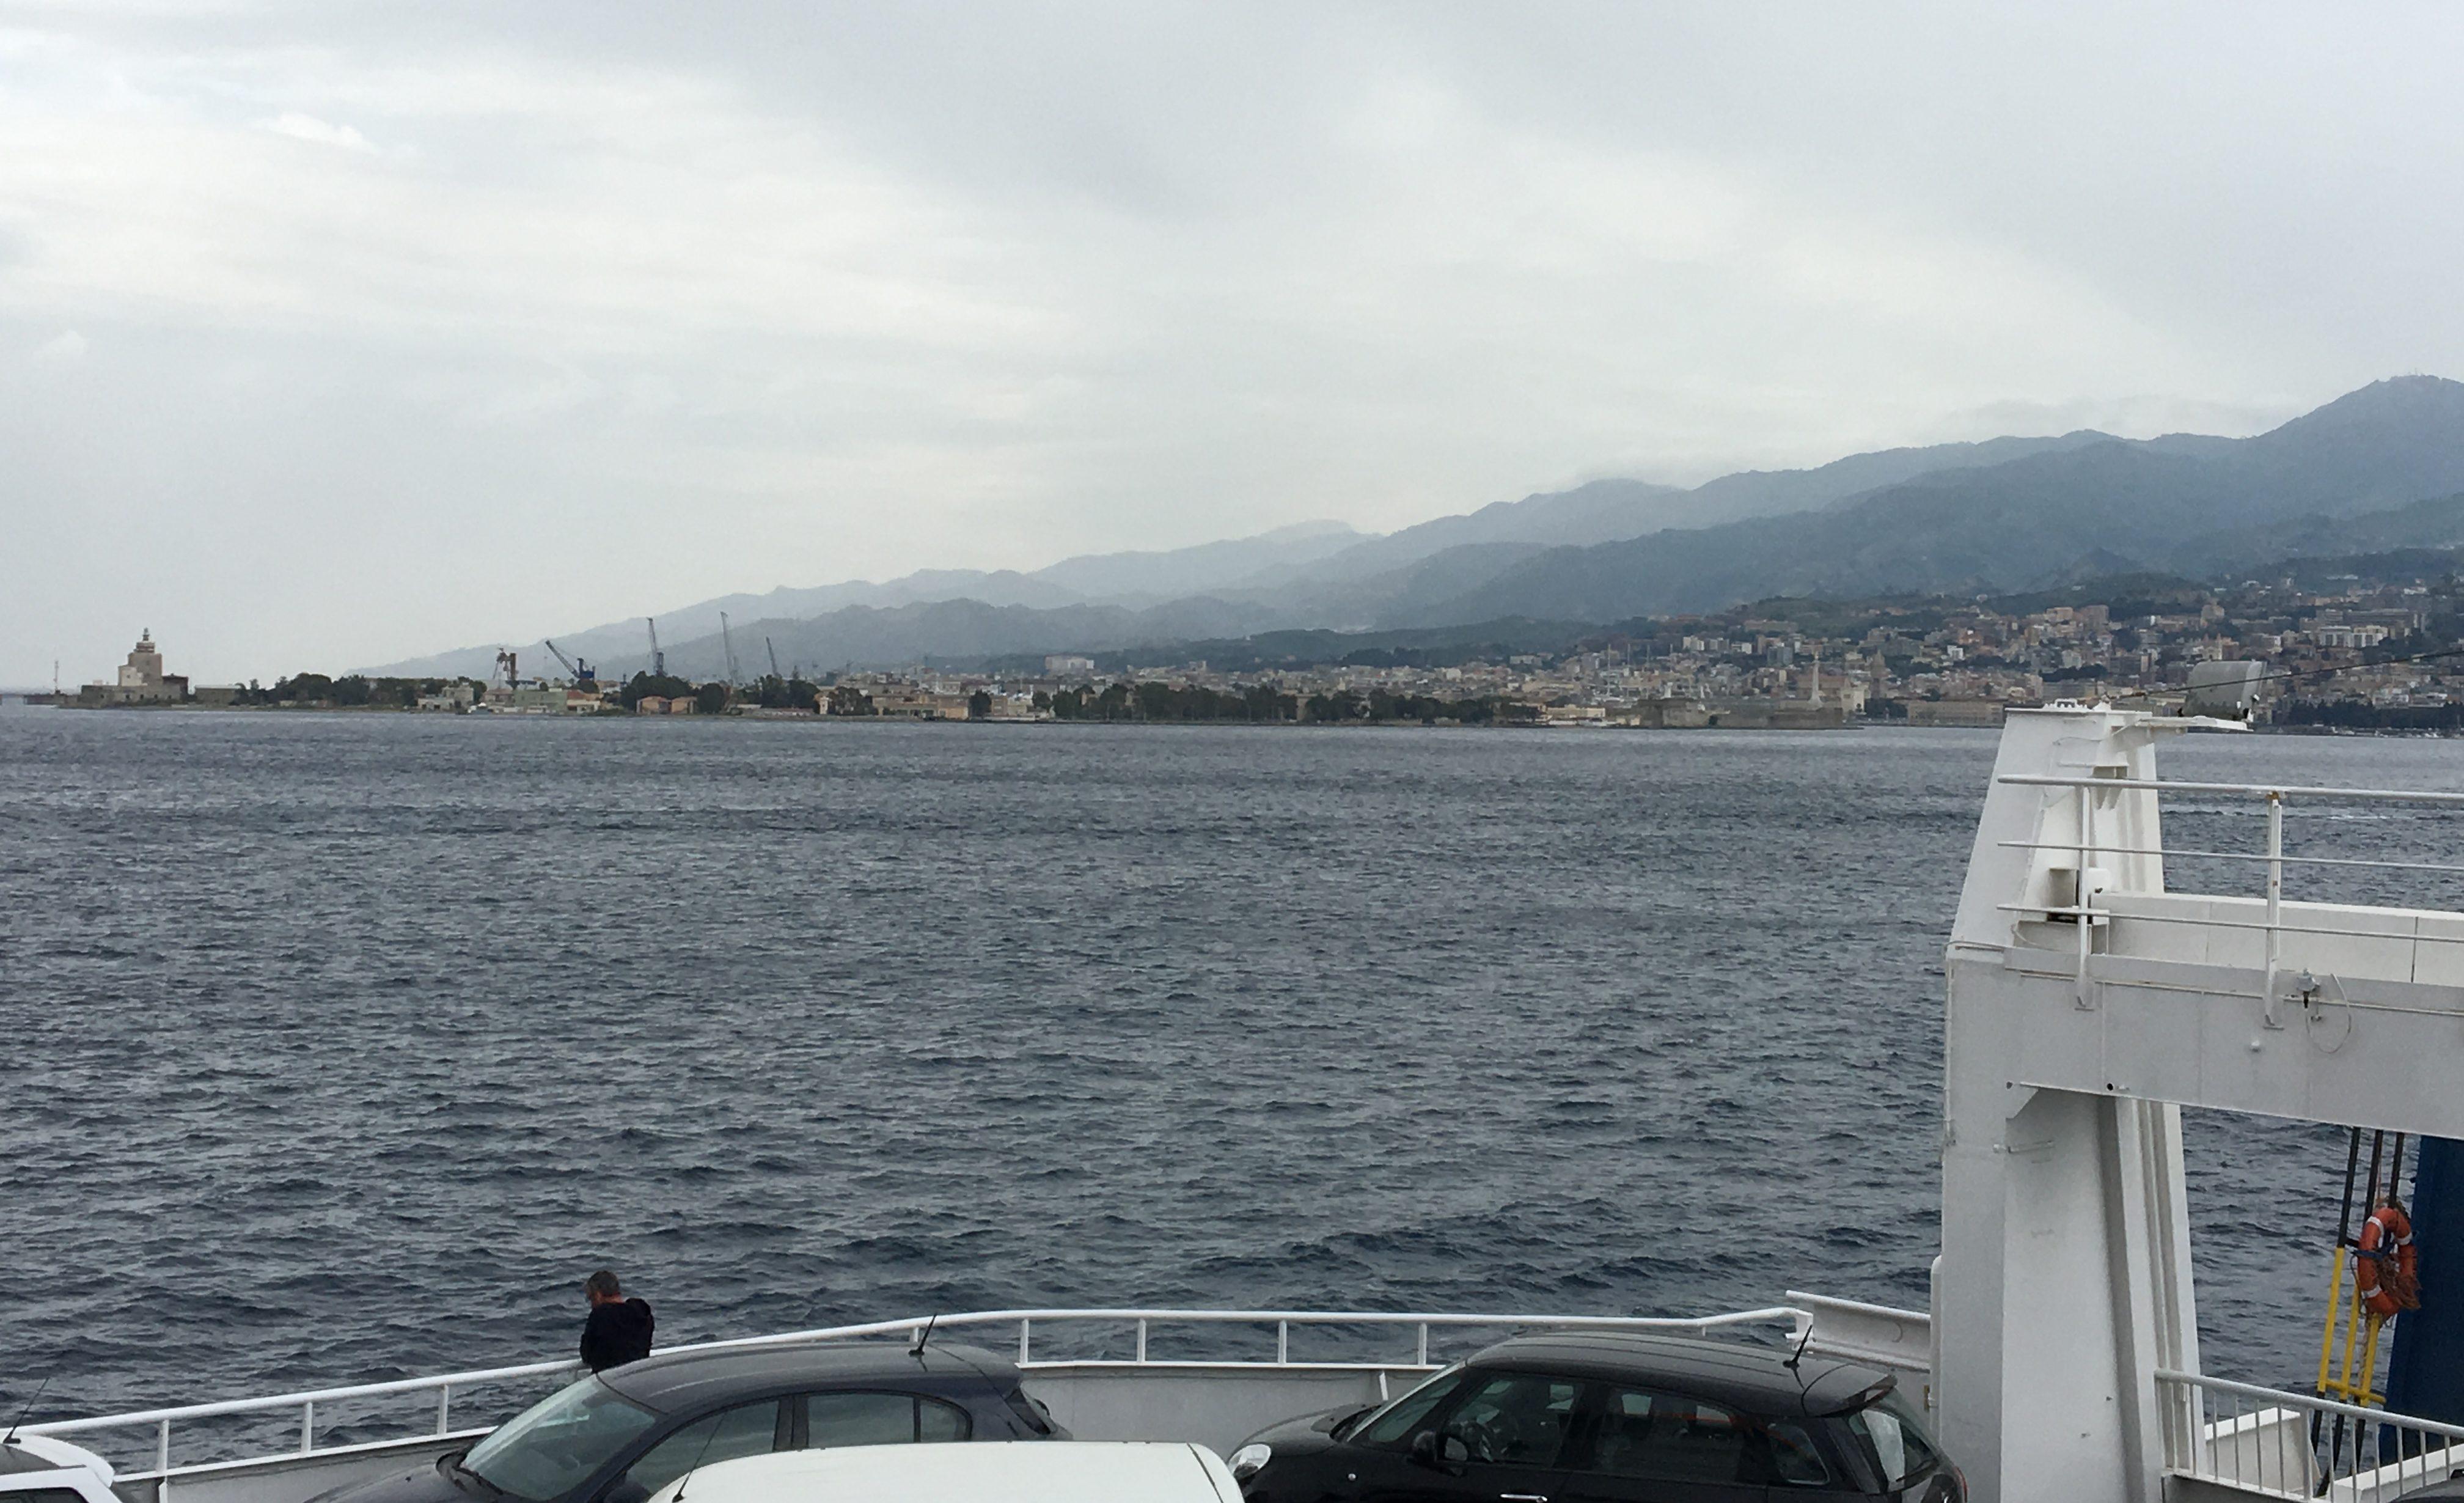 Überfahrt Messina nach Villa San Giovanni